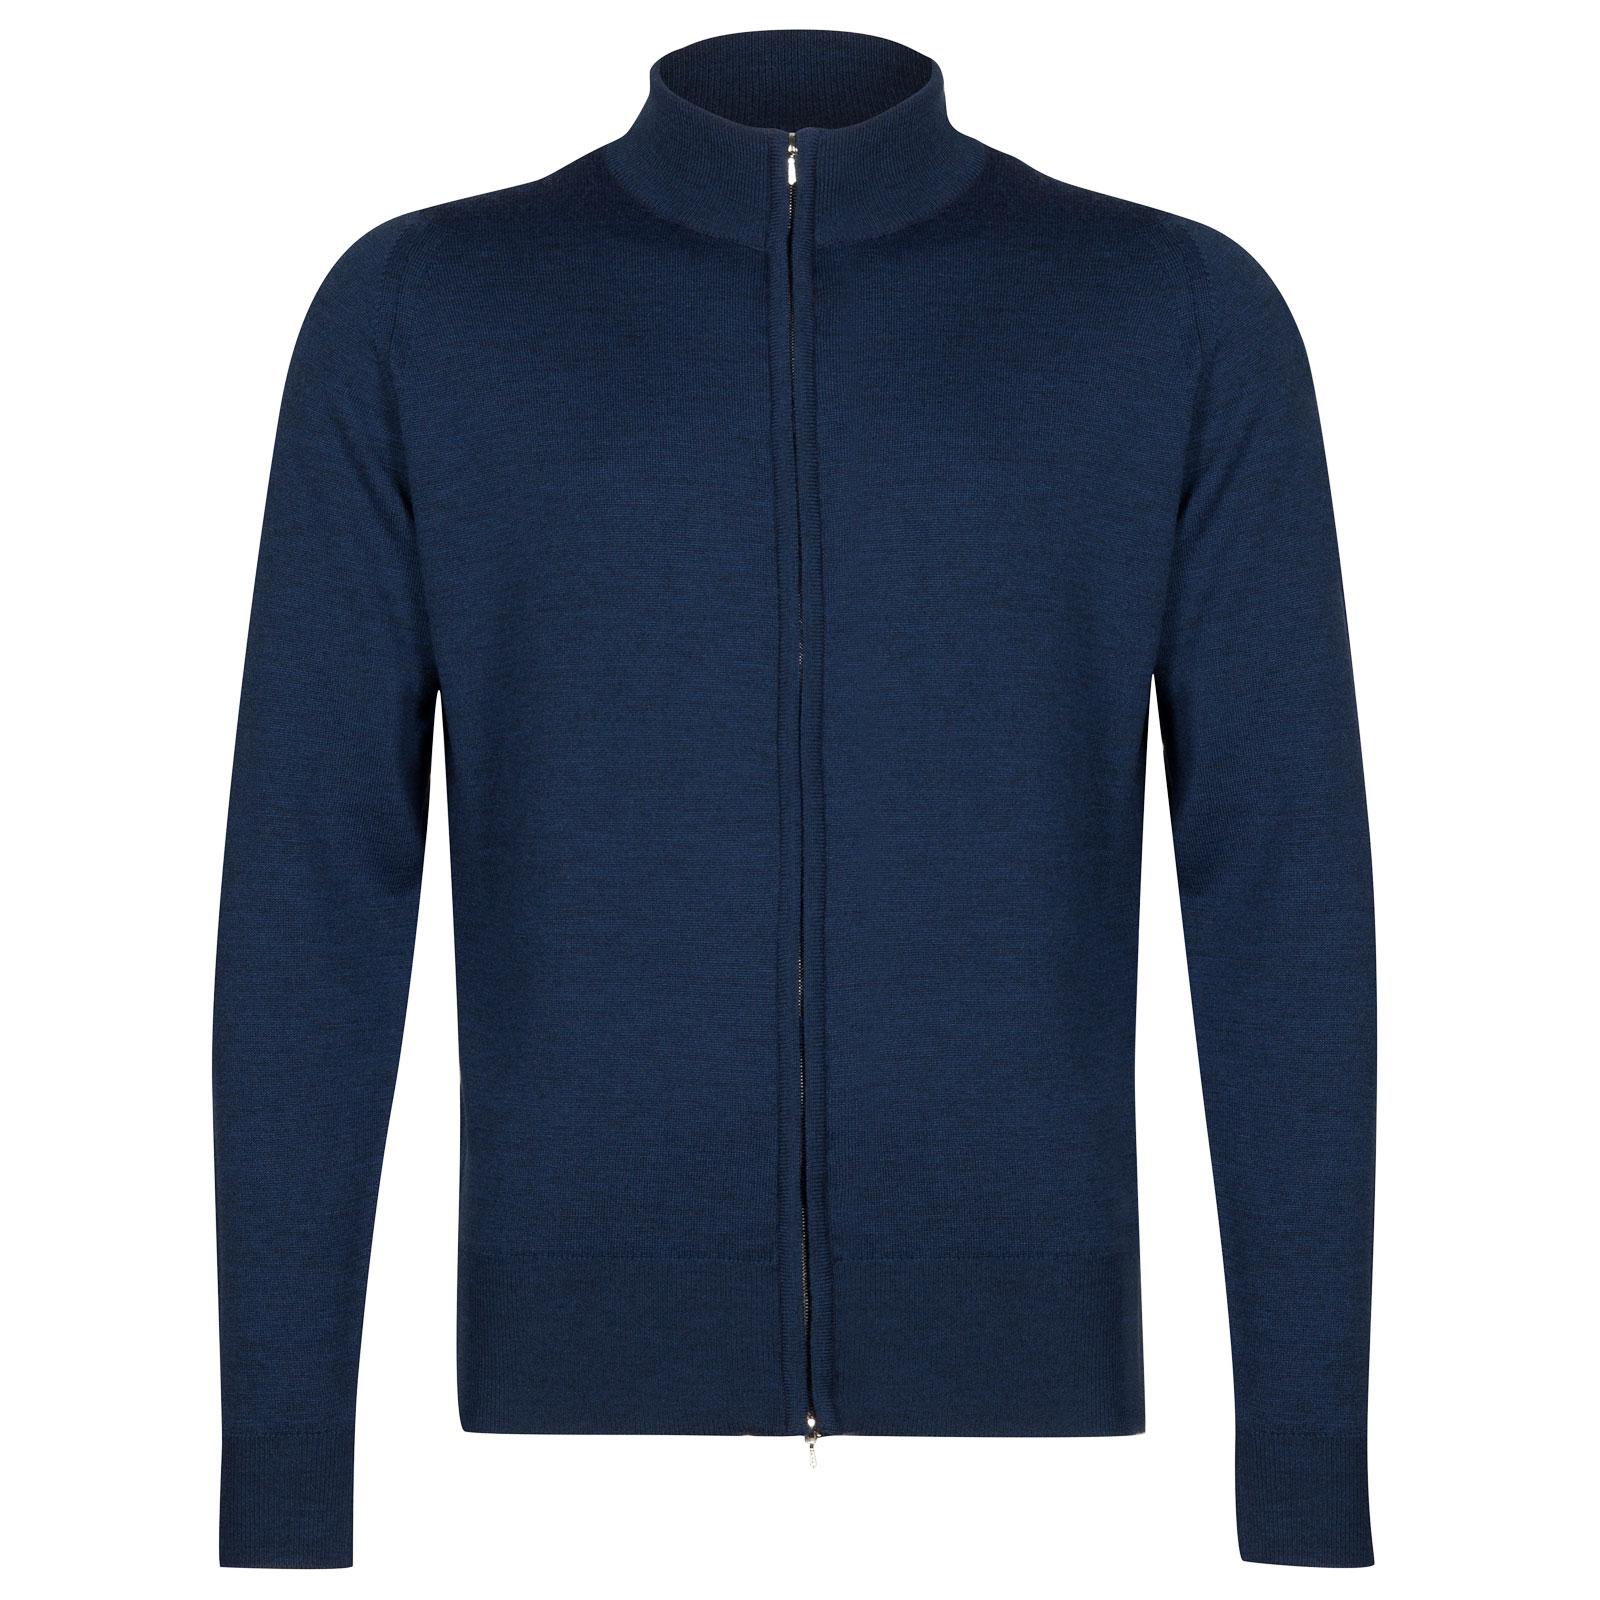 John Smedley claygate Merino Wool Jacket in Indigo-M